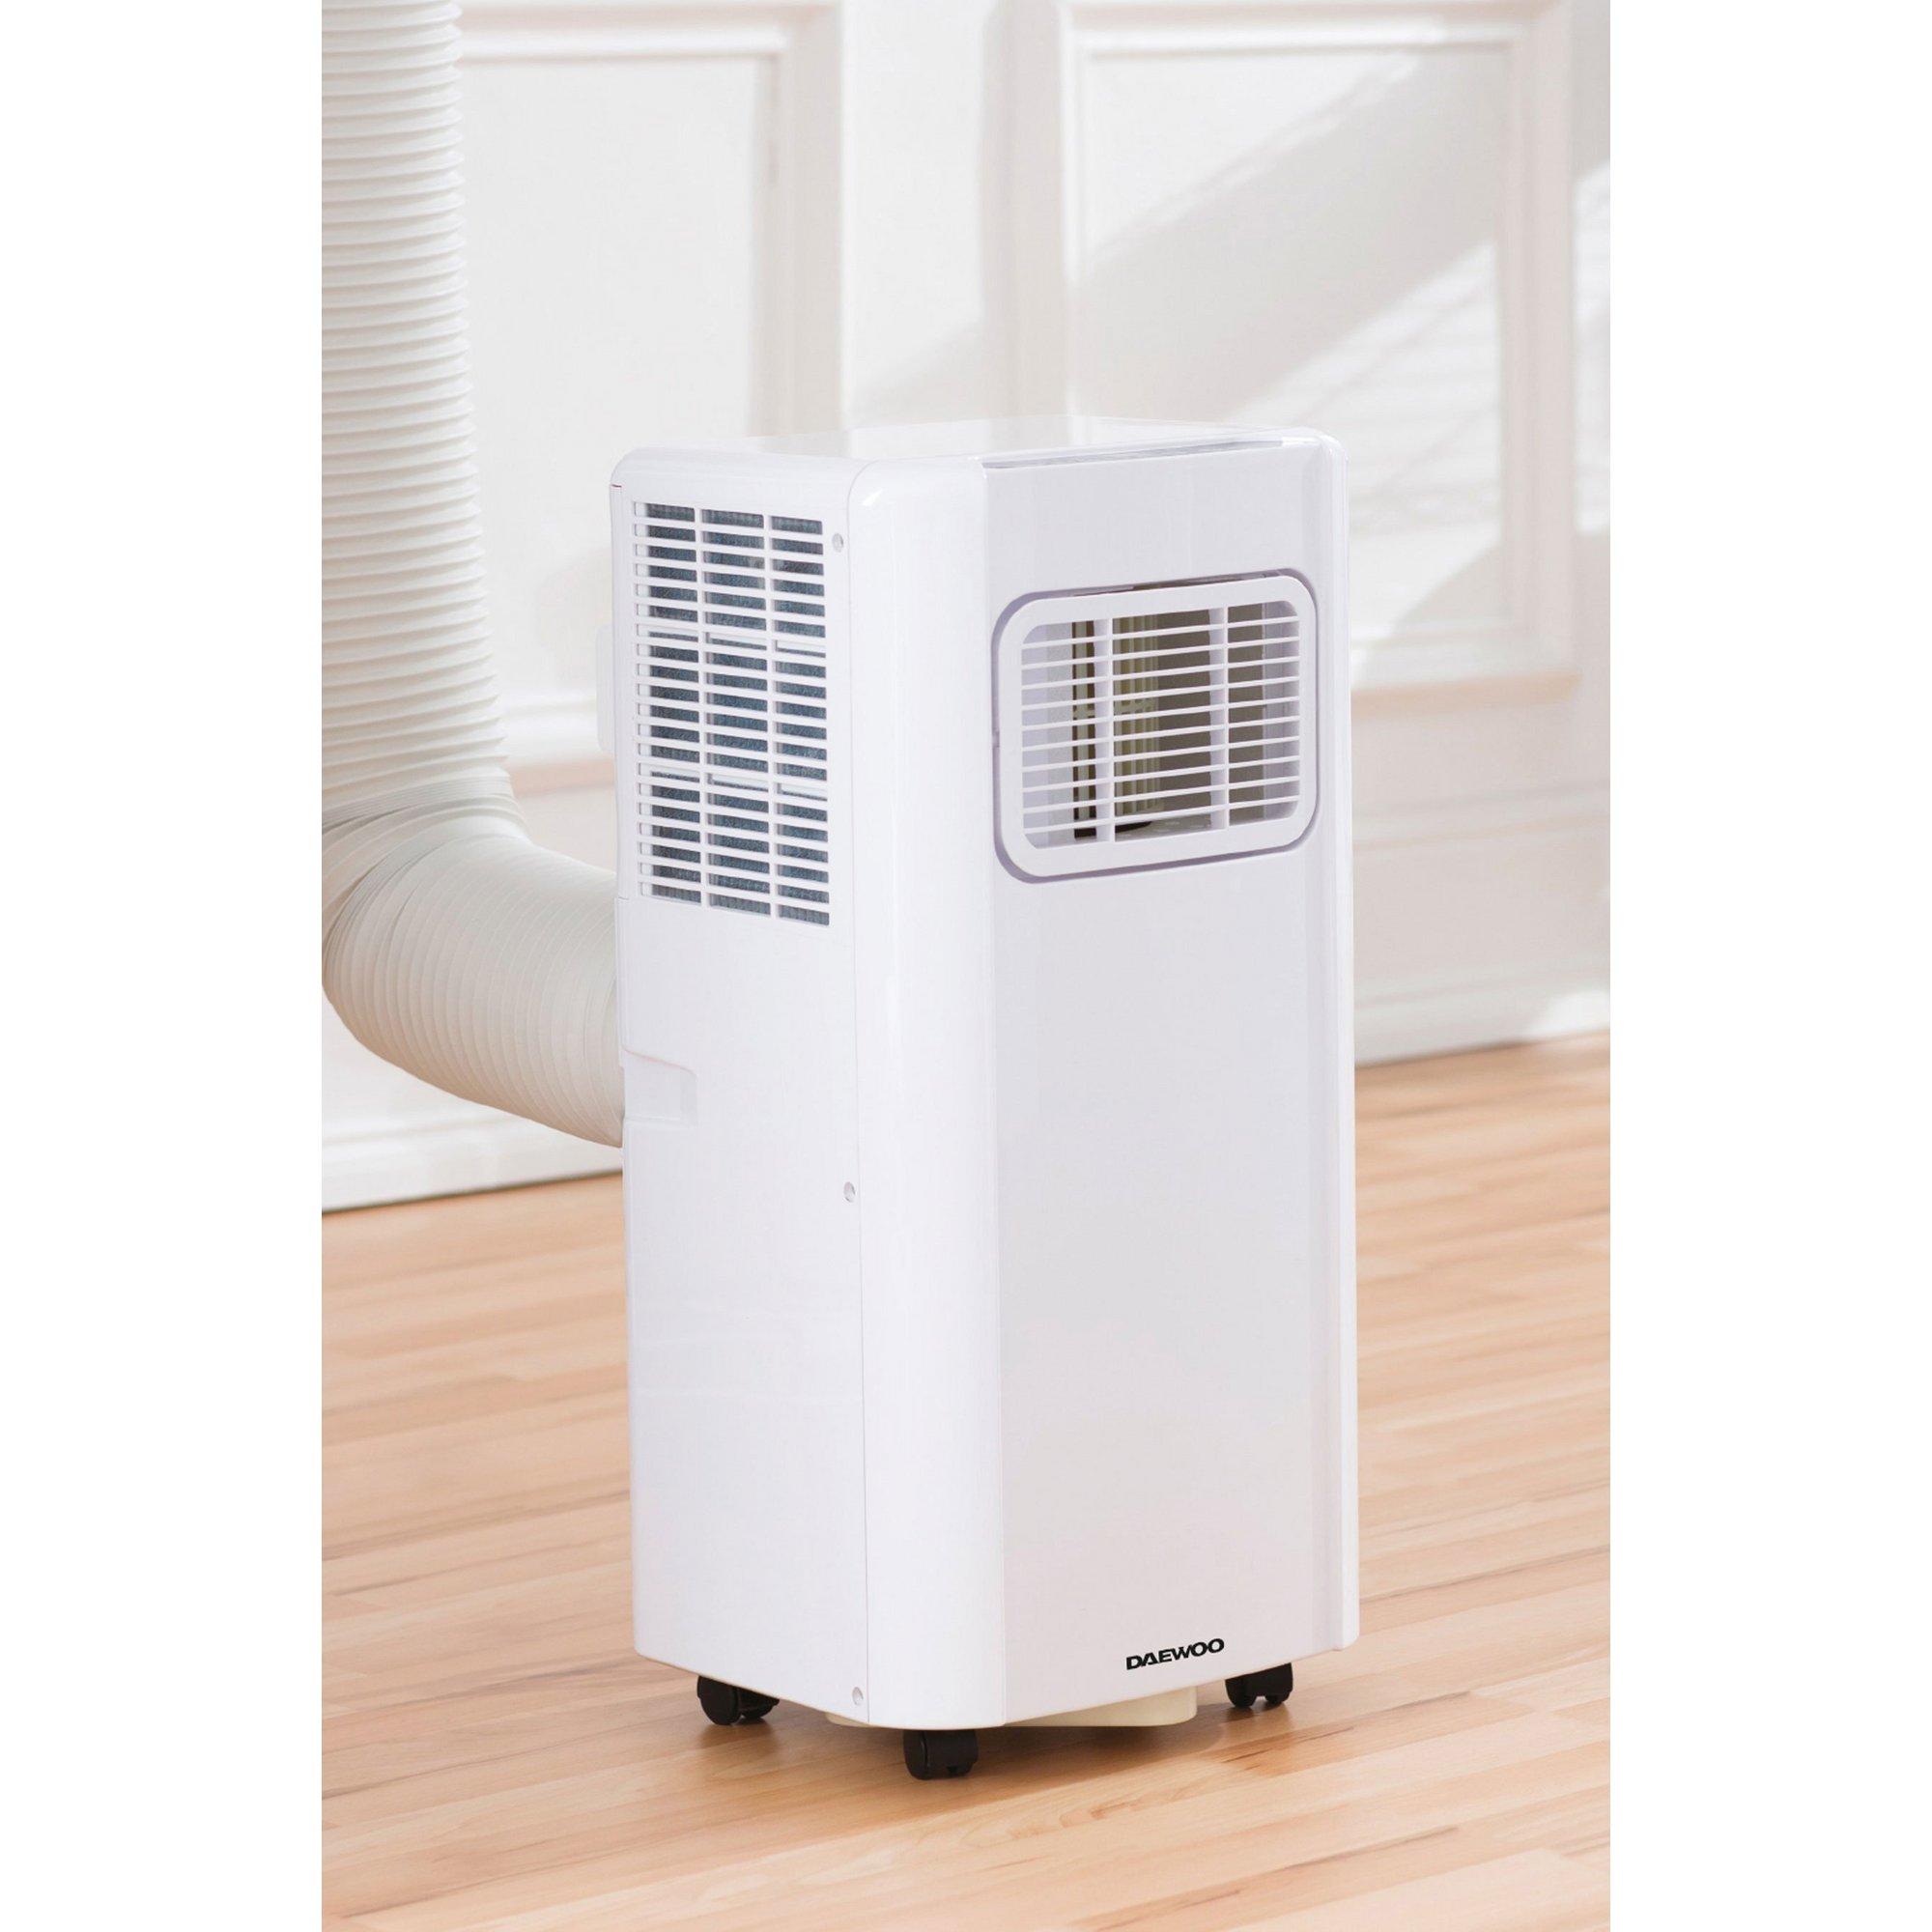 Image of Daewoo 5000 BTU Portable Air Conditioning Unit